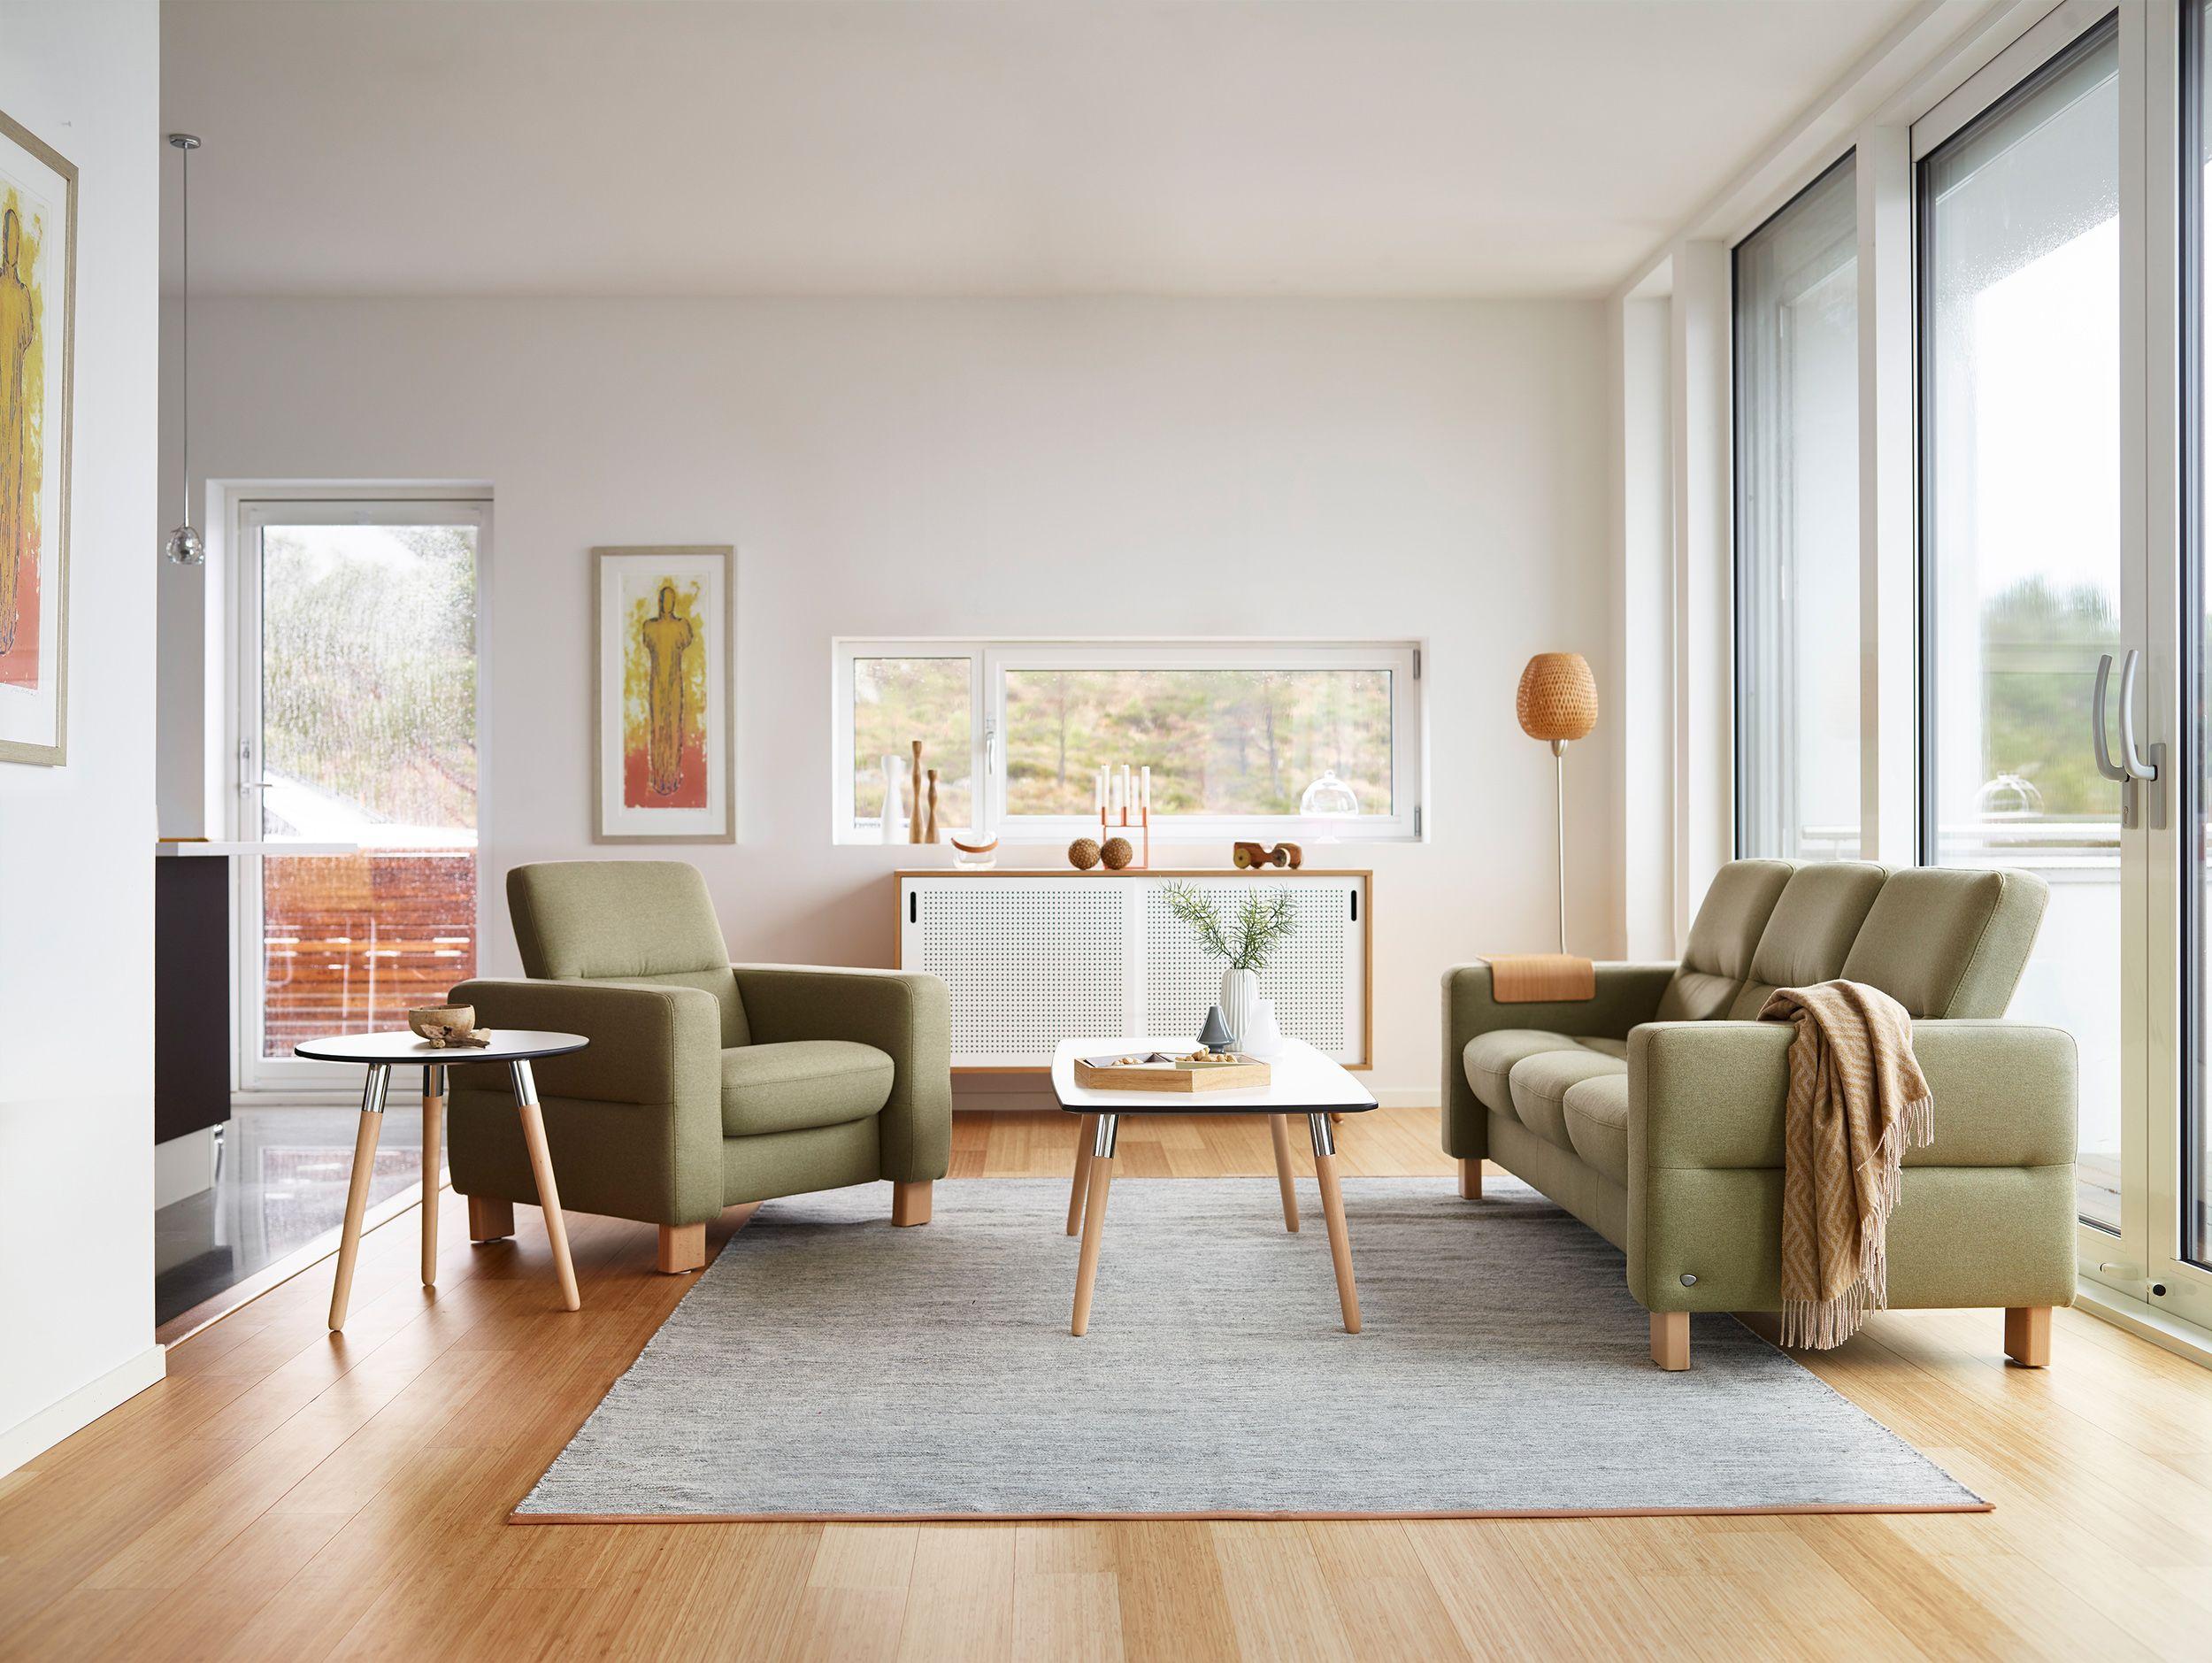 stressless wave sofa als sessel und 3 sitzer niedrige r ckenh he in der ausf hrung stoff. Black Bedroom Furniture Sets. Home Design Ideas